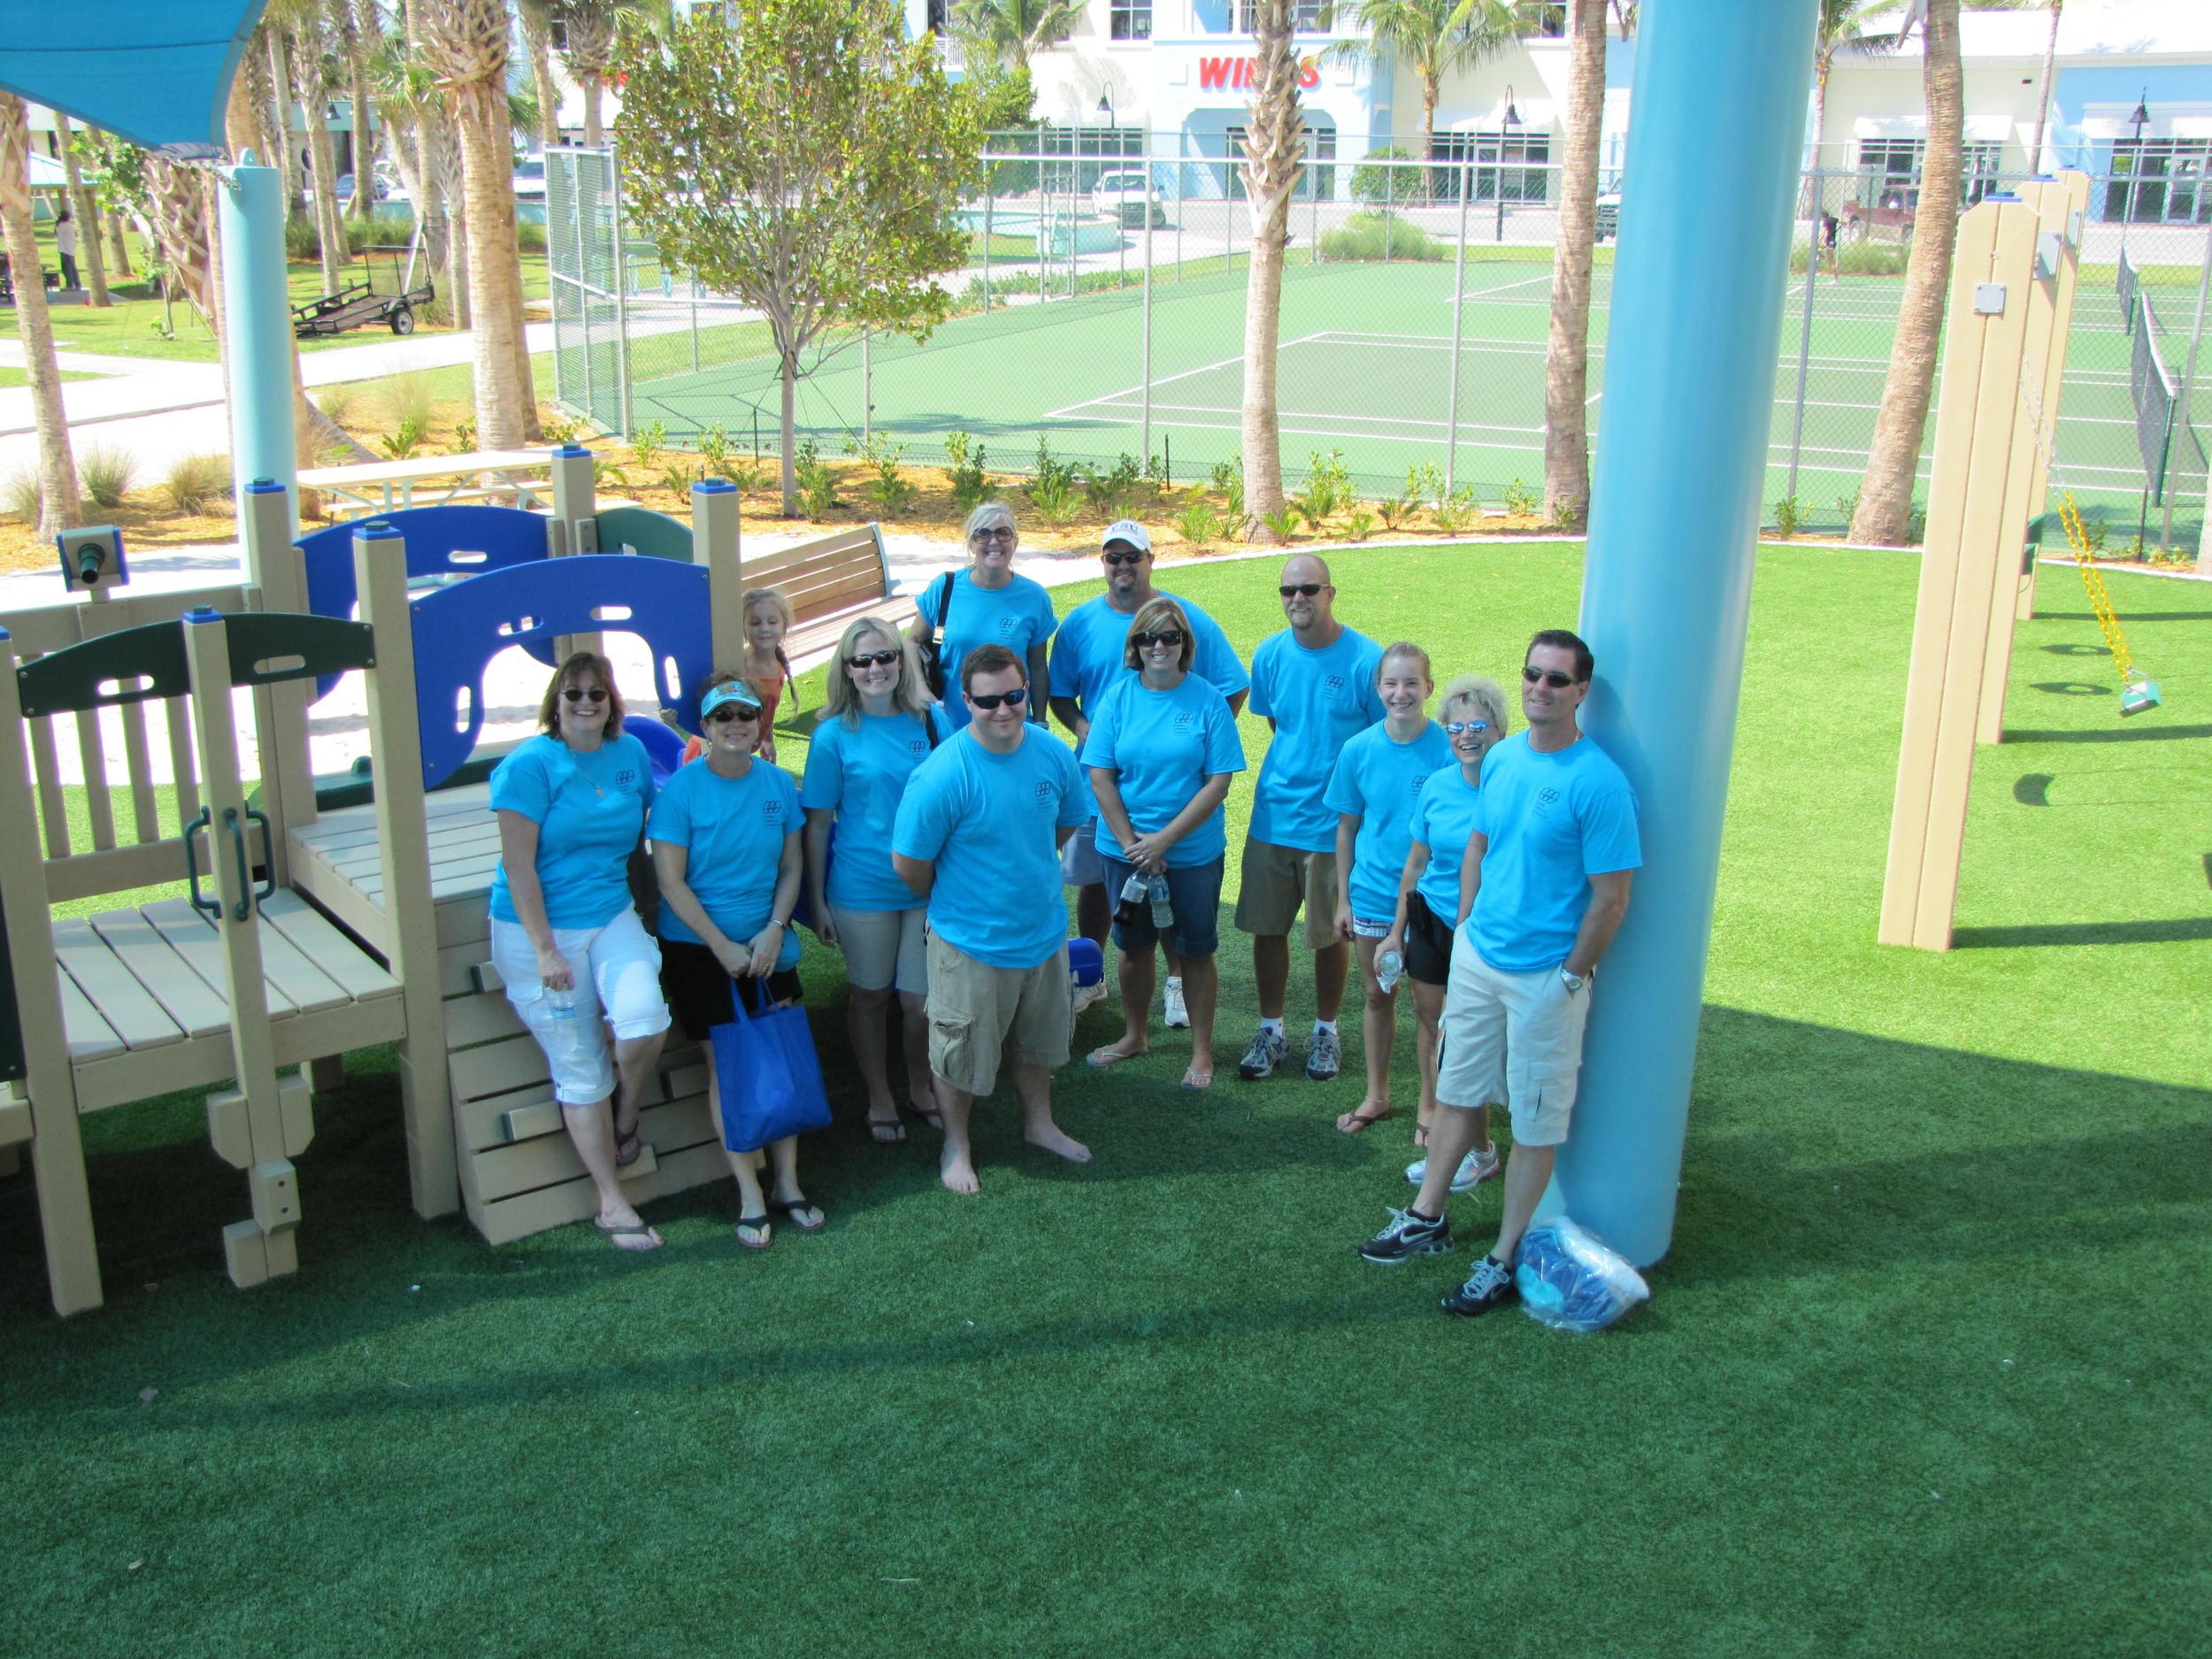 City of Riviera Beach Municipal Beach Park Ocean Mall GHO Team Synthetic Turf Playground.jpg